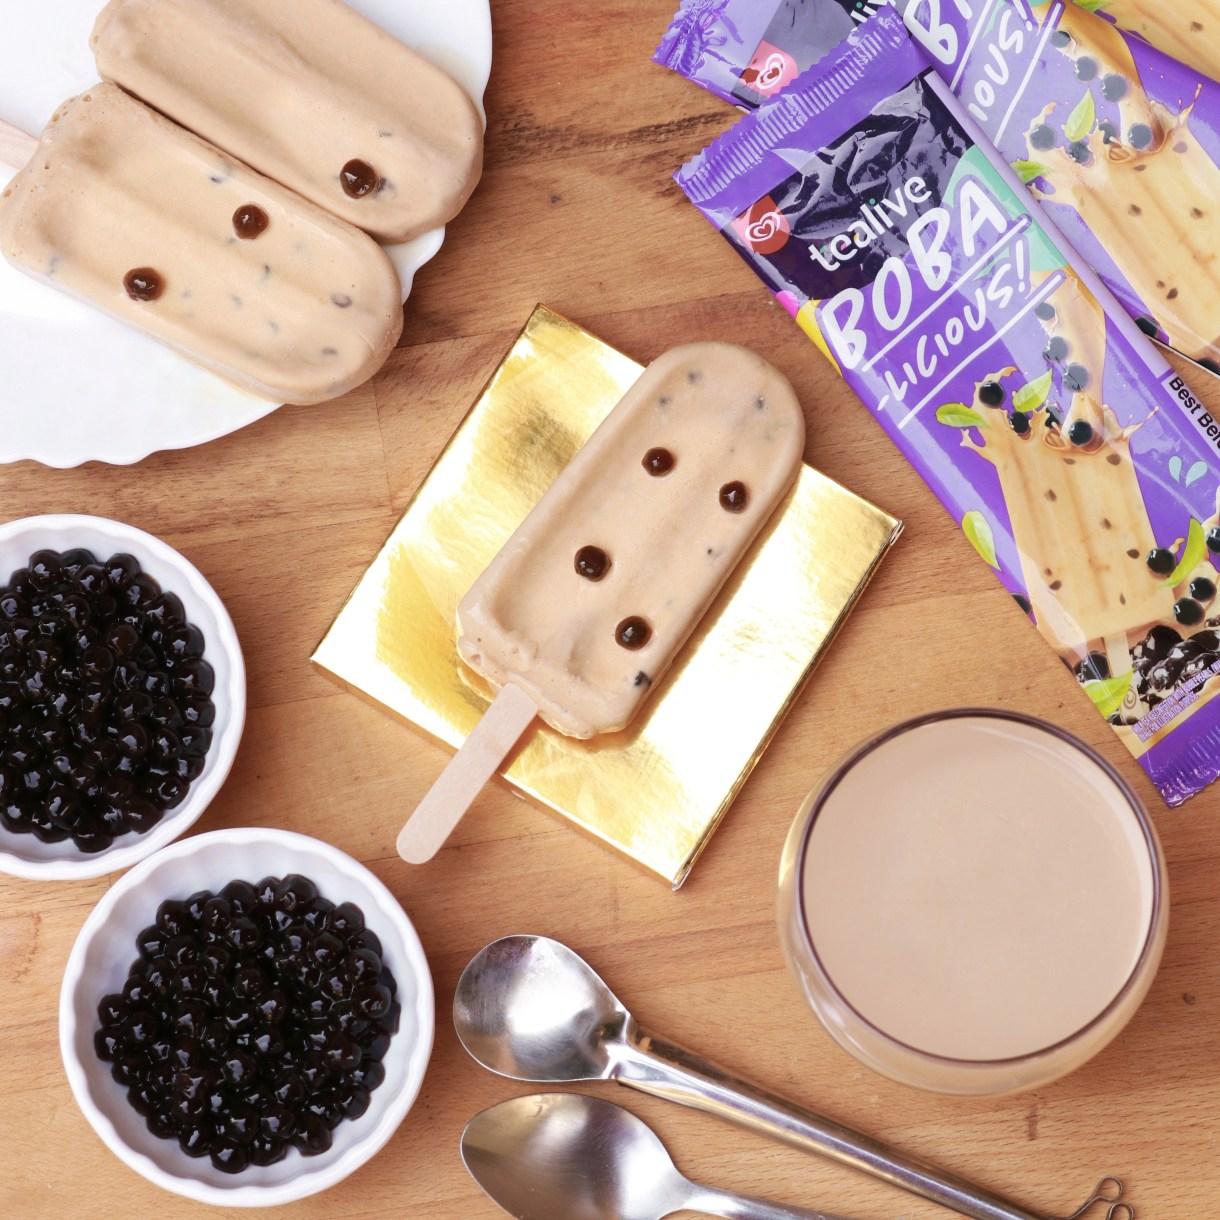 Wall's Tealive Boba Ice Cream